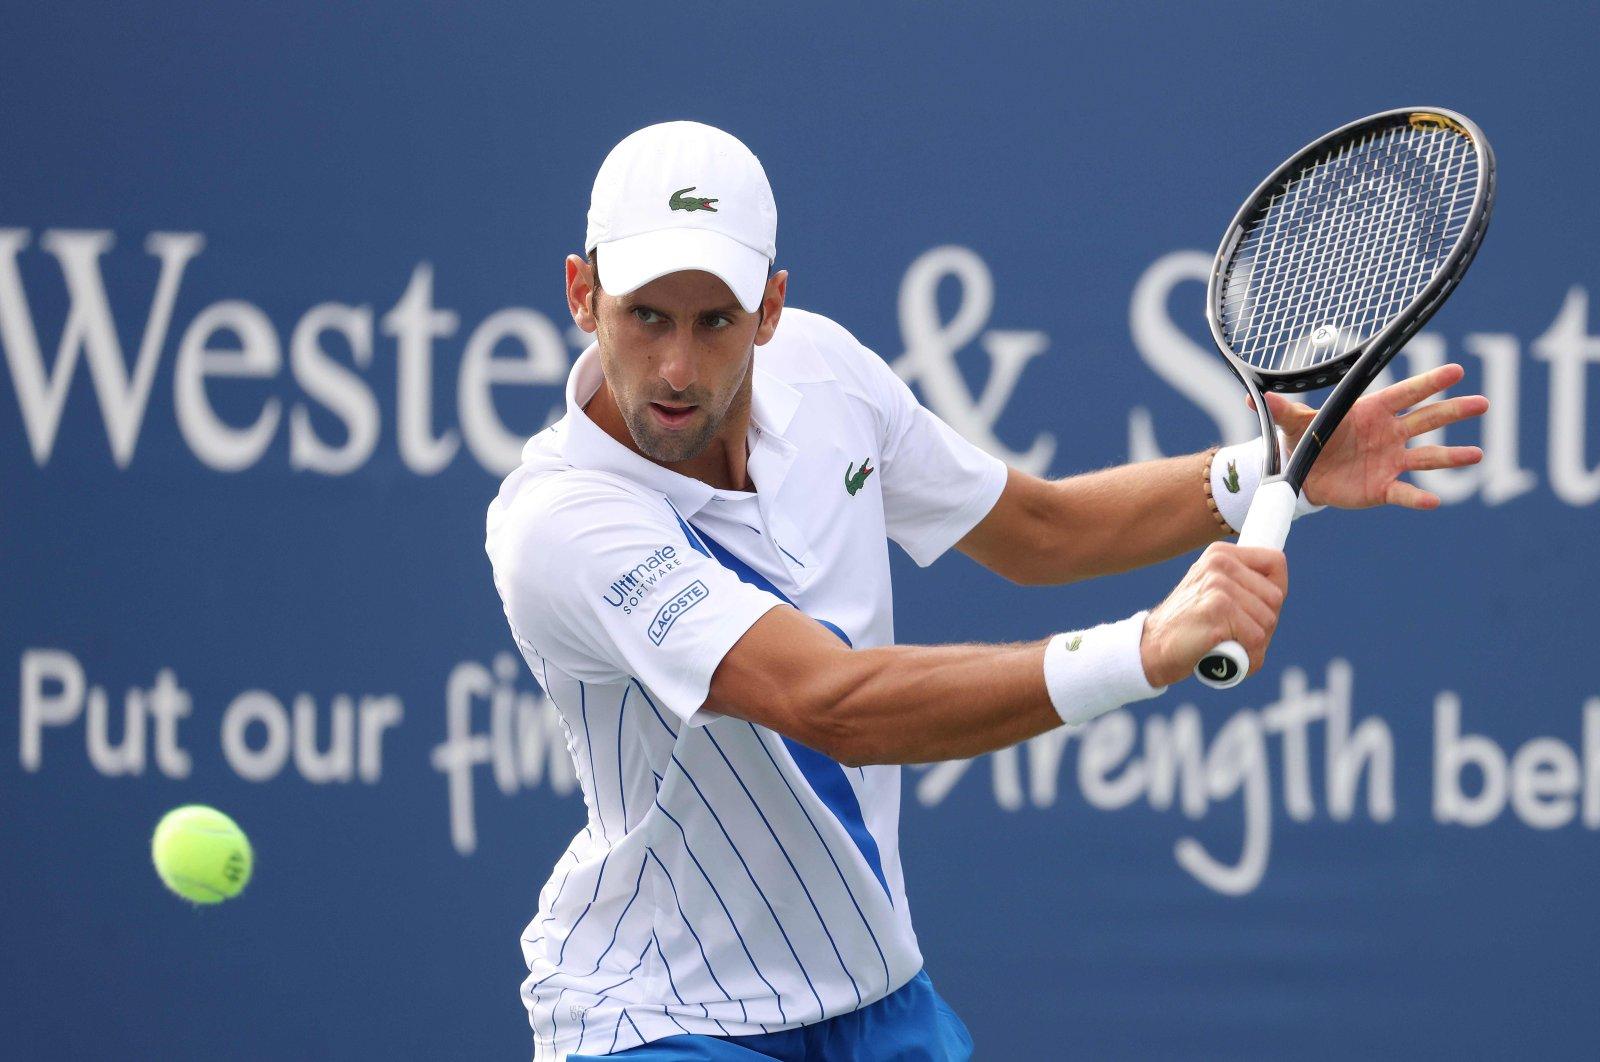 Novak Djokovic  returns a shot against Jan Leonard Struff during the Western & Southern Open, New York City, New York, U.S., Aug. 26, 2020. (AFP Photo)